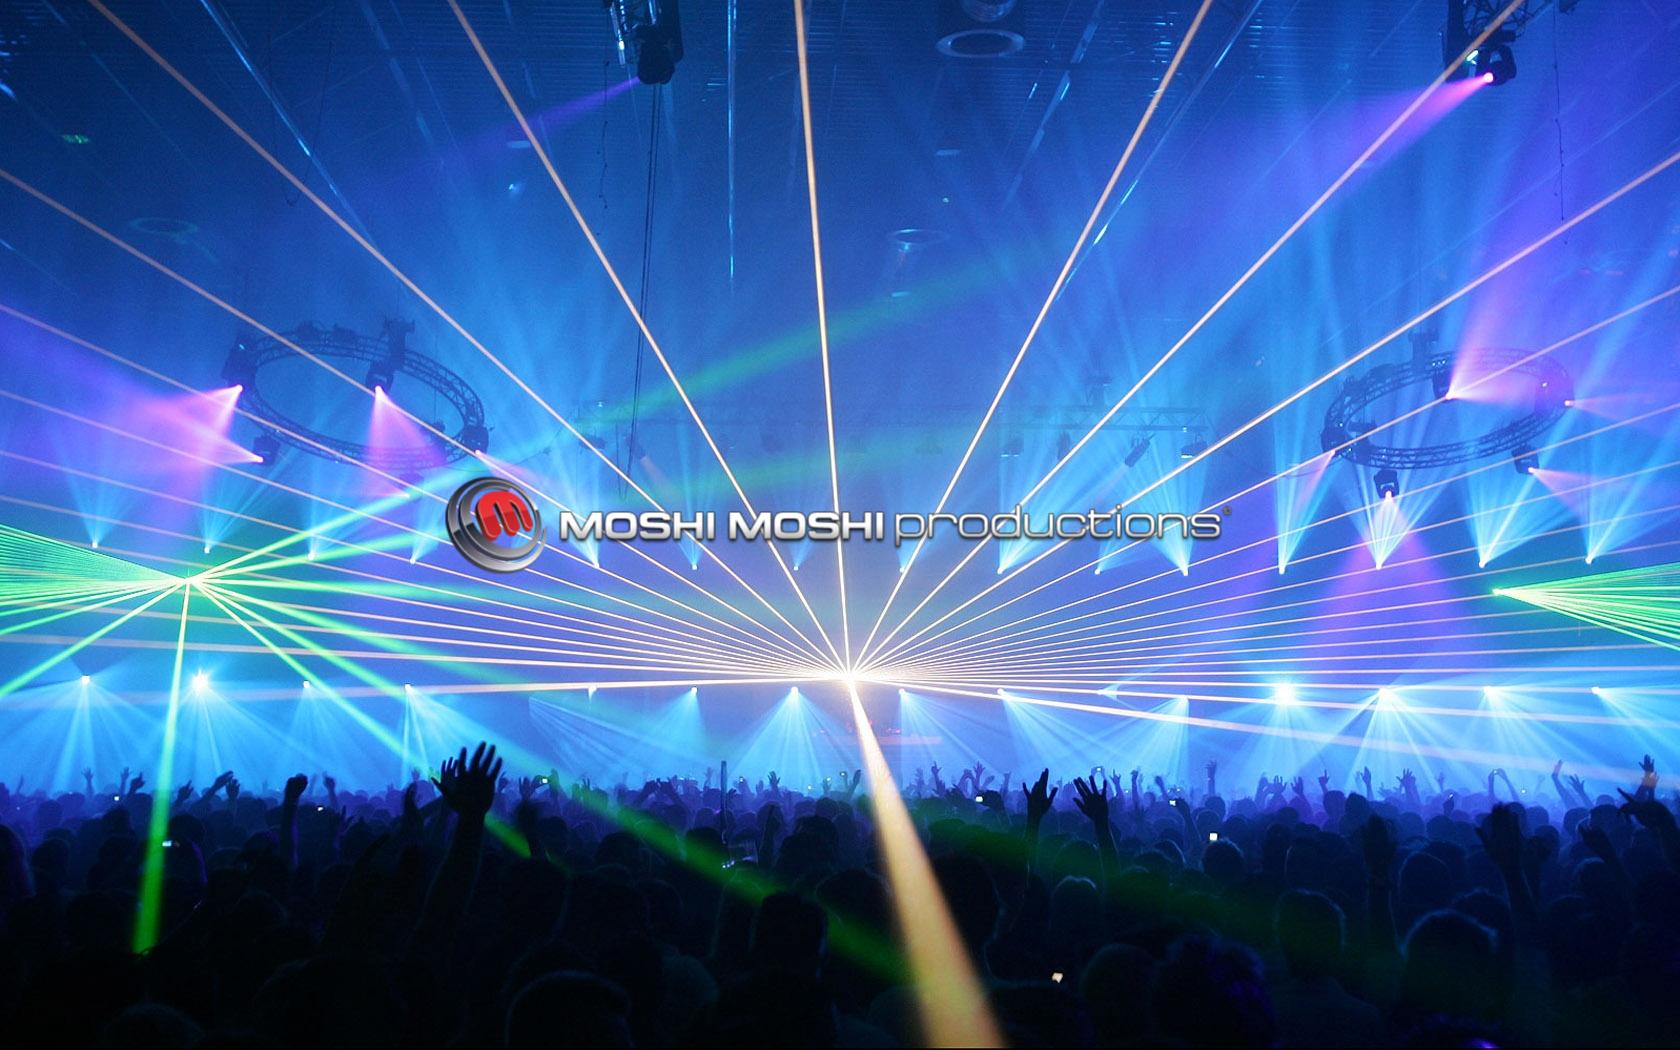 Moshi Moshi Productions